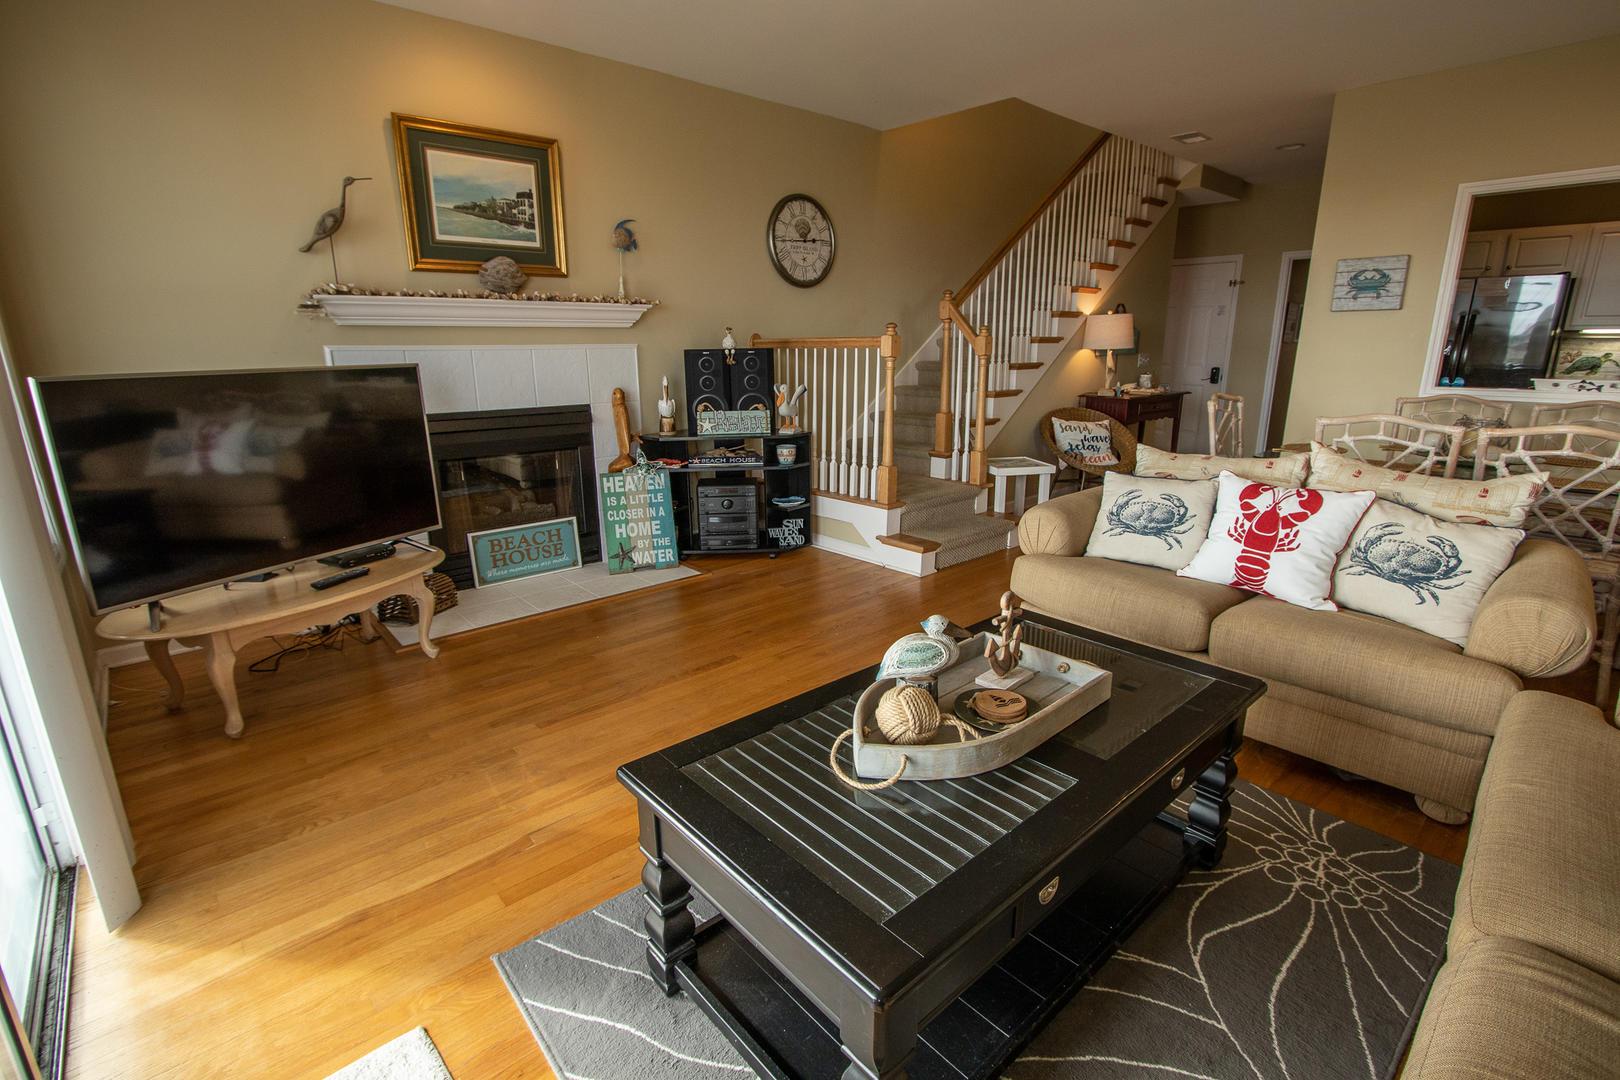 Living, TV, stereo, access to balcony